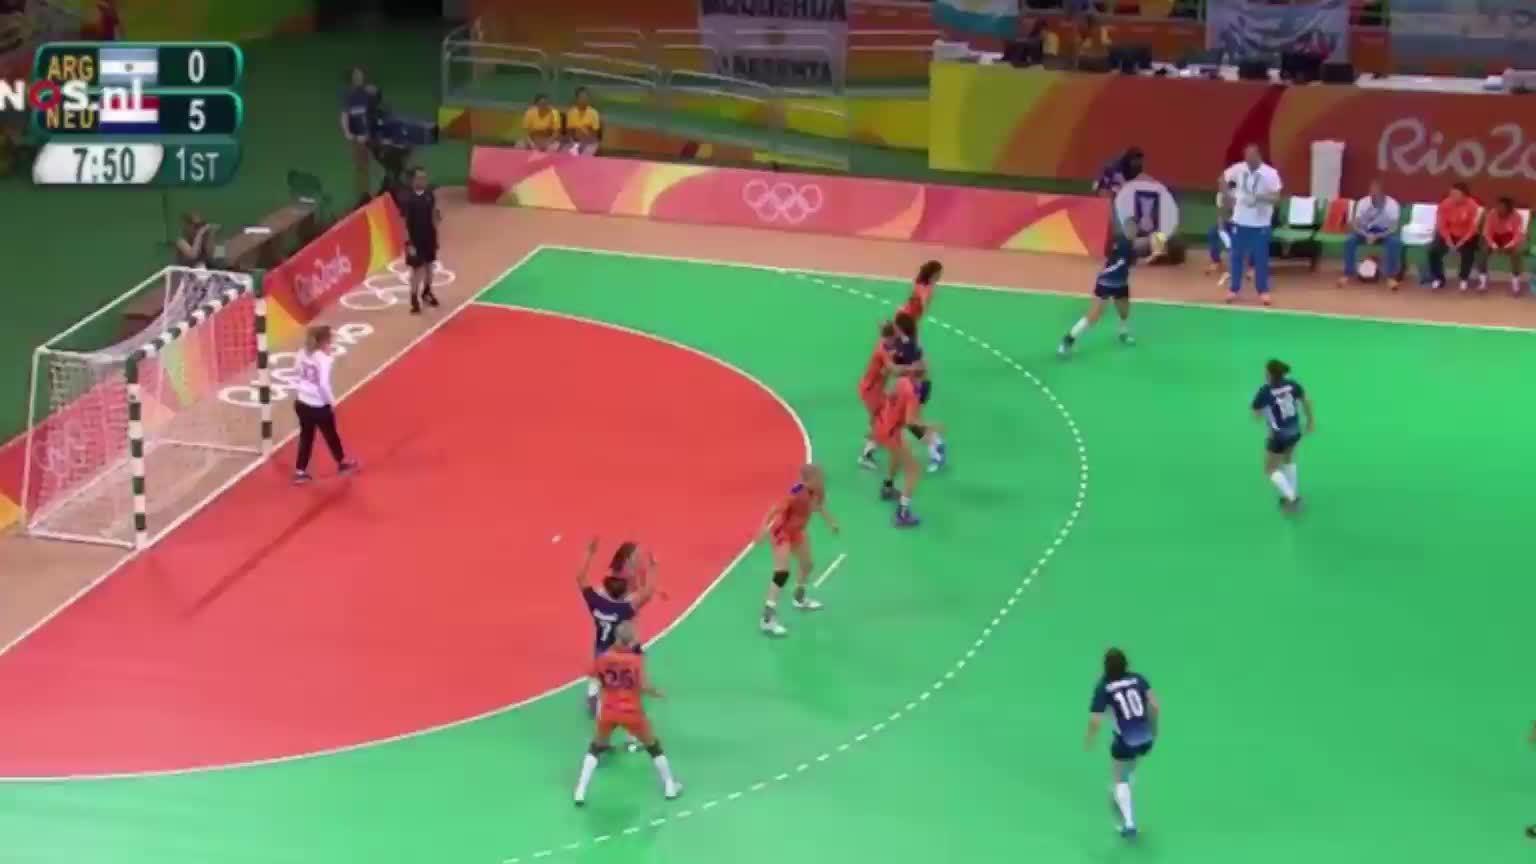 Wester, handball, olymgifs, Tess Wester scores a full pitch goal GIFs